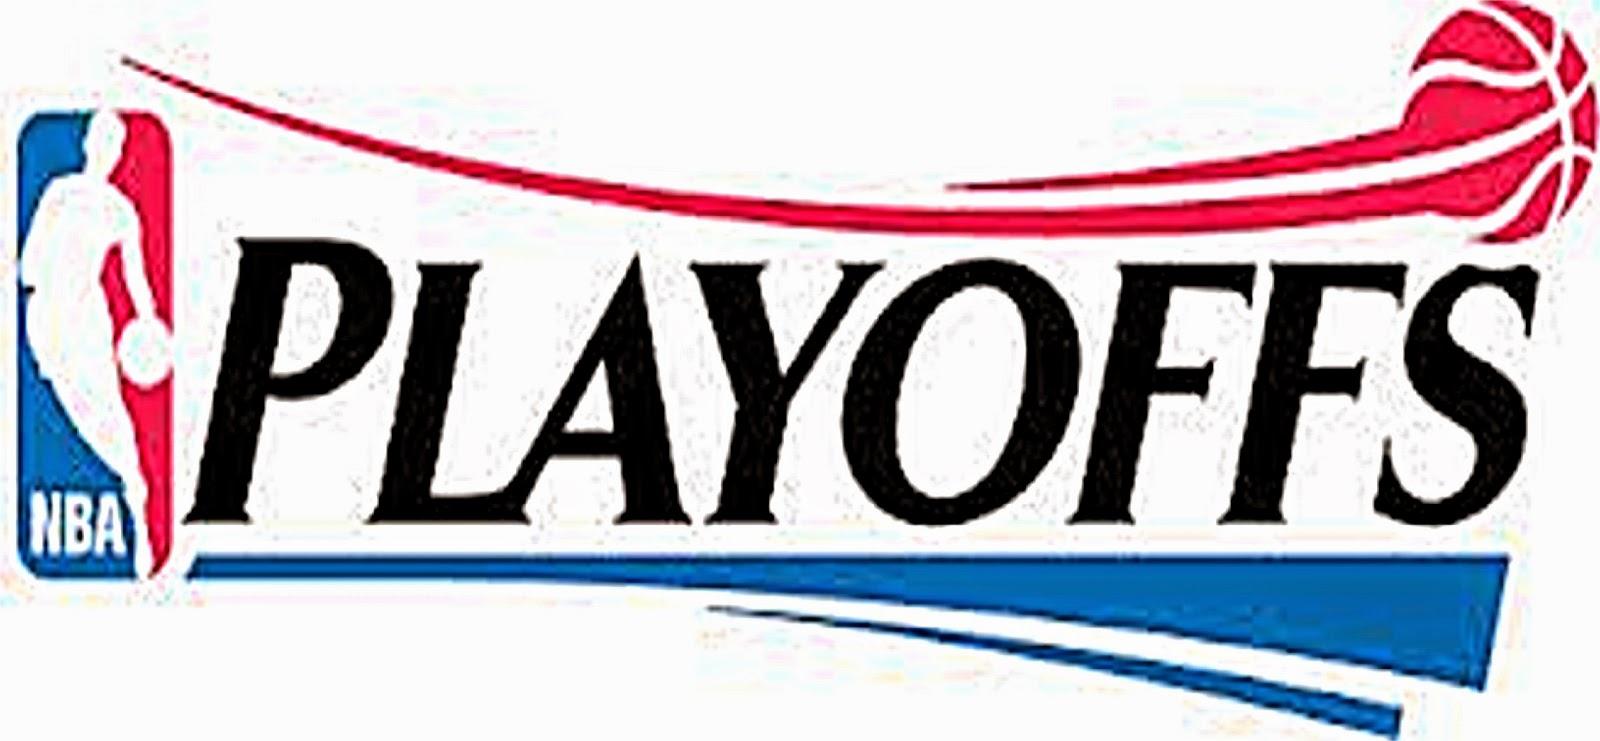 NBA Playoff Schedule 2015-2016 | NBA Live Scores | NBA ...